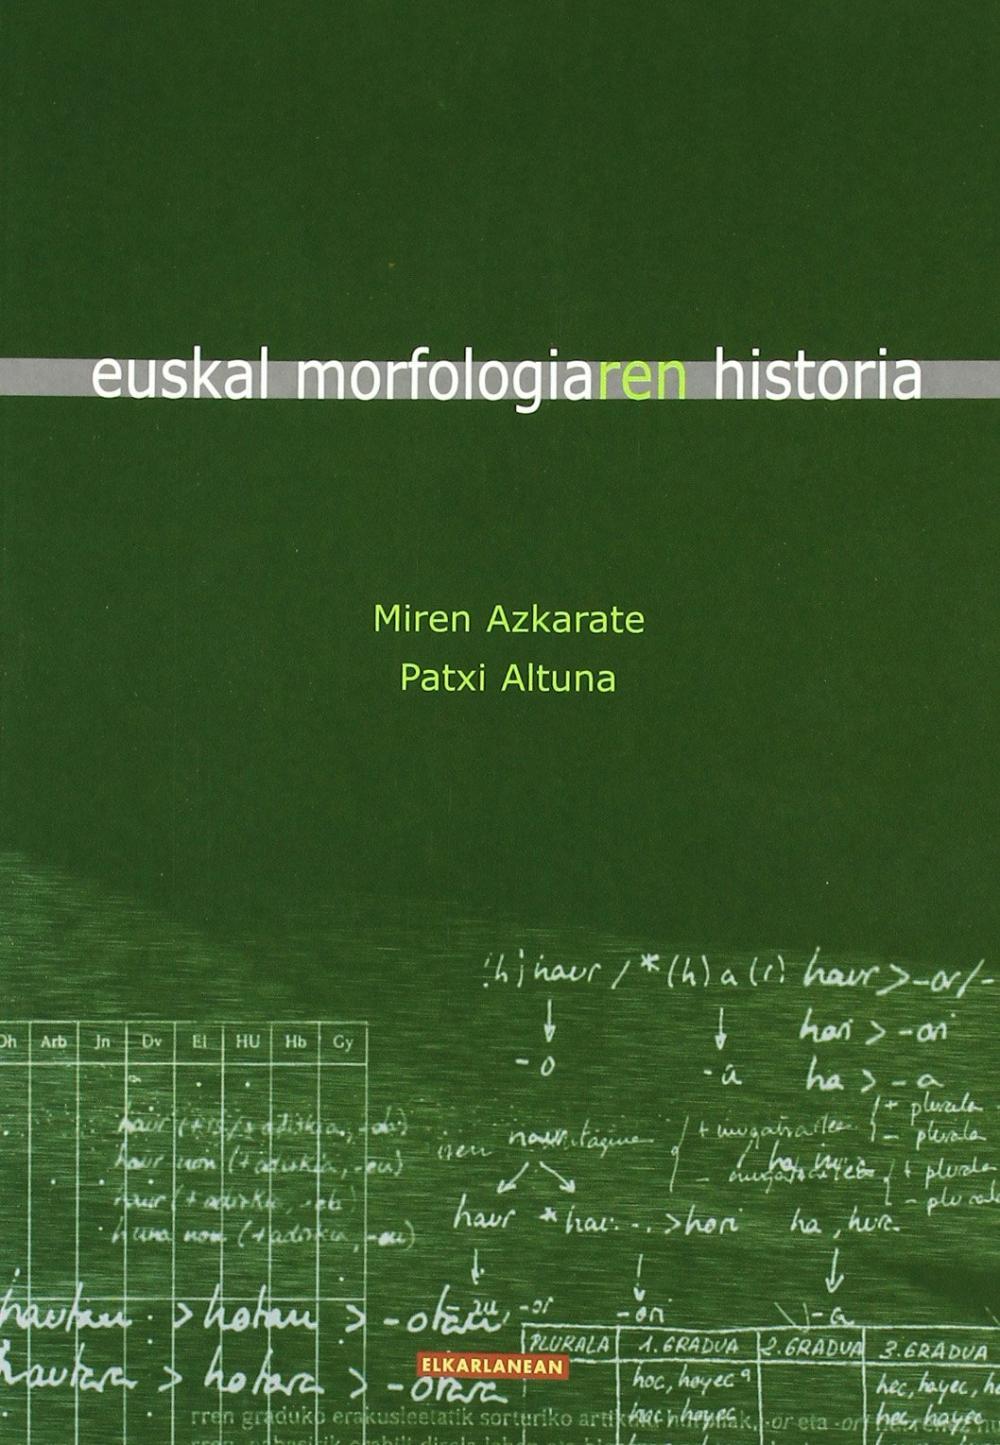 Euskal morfologiaren historia